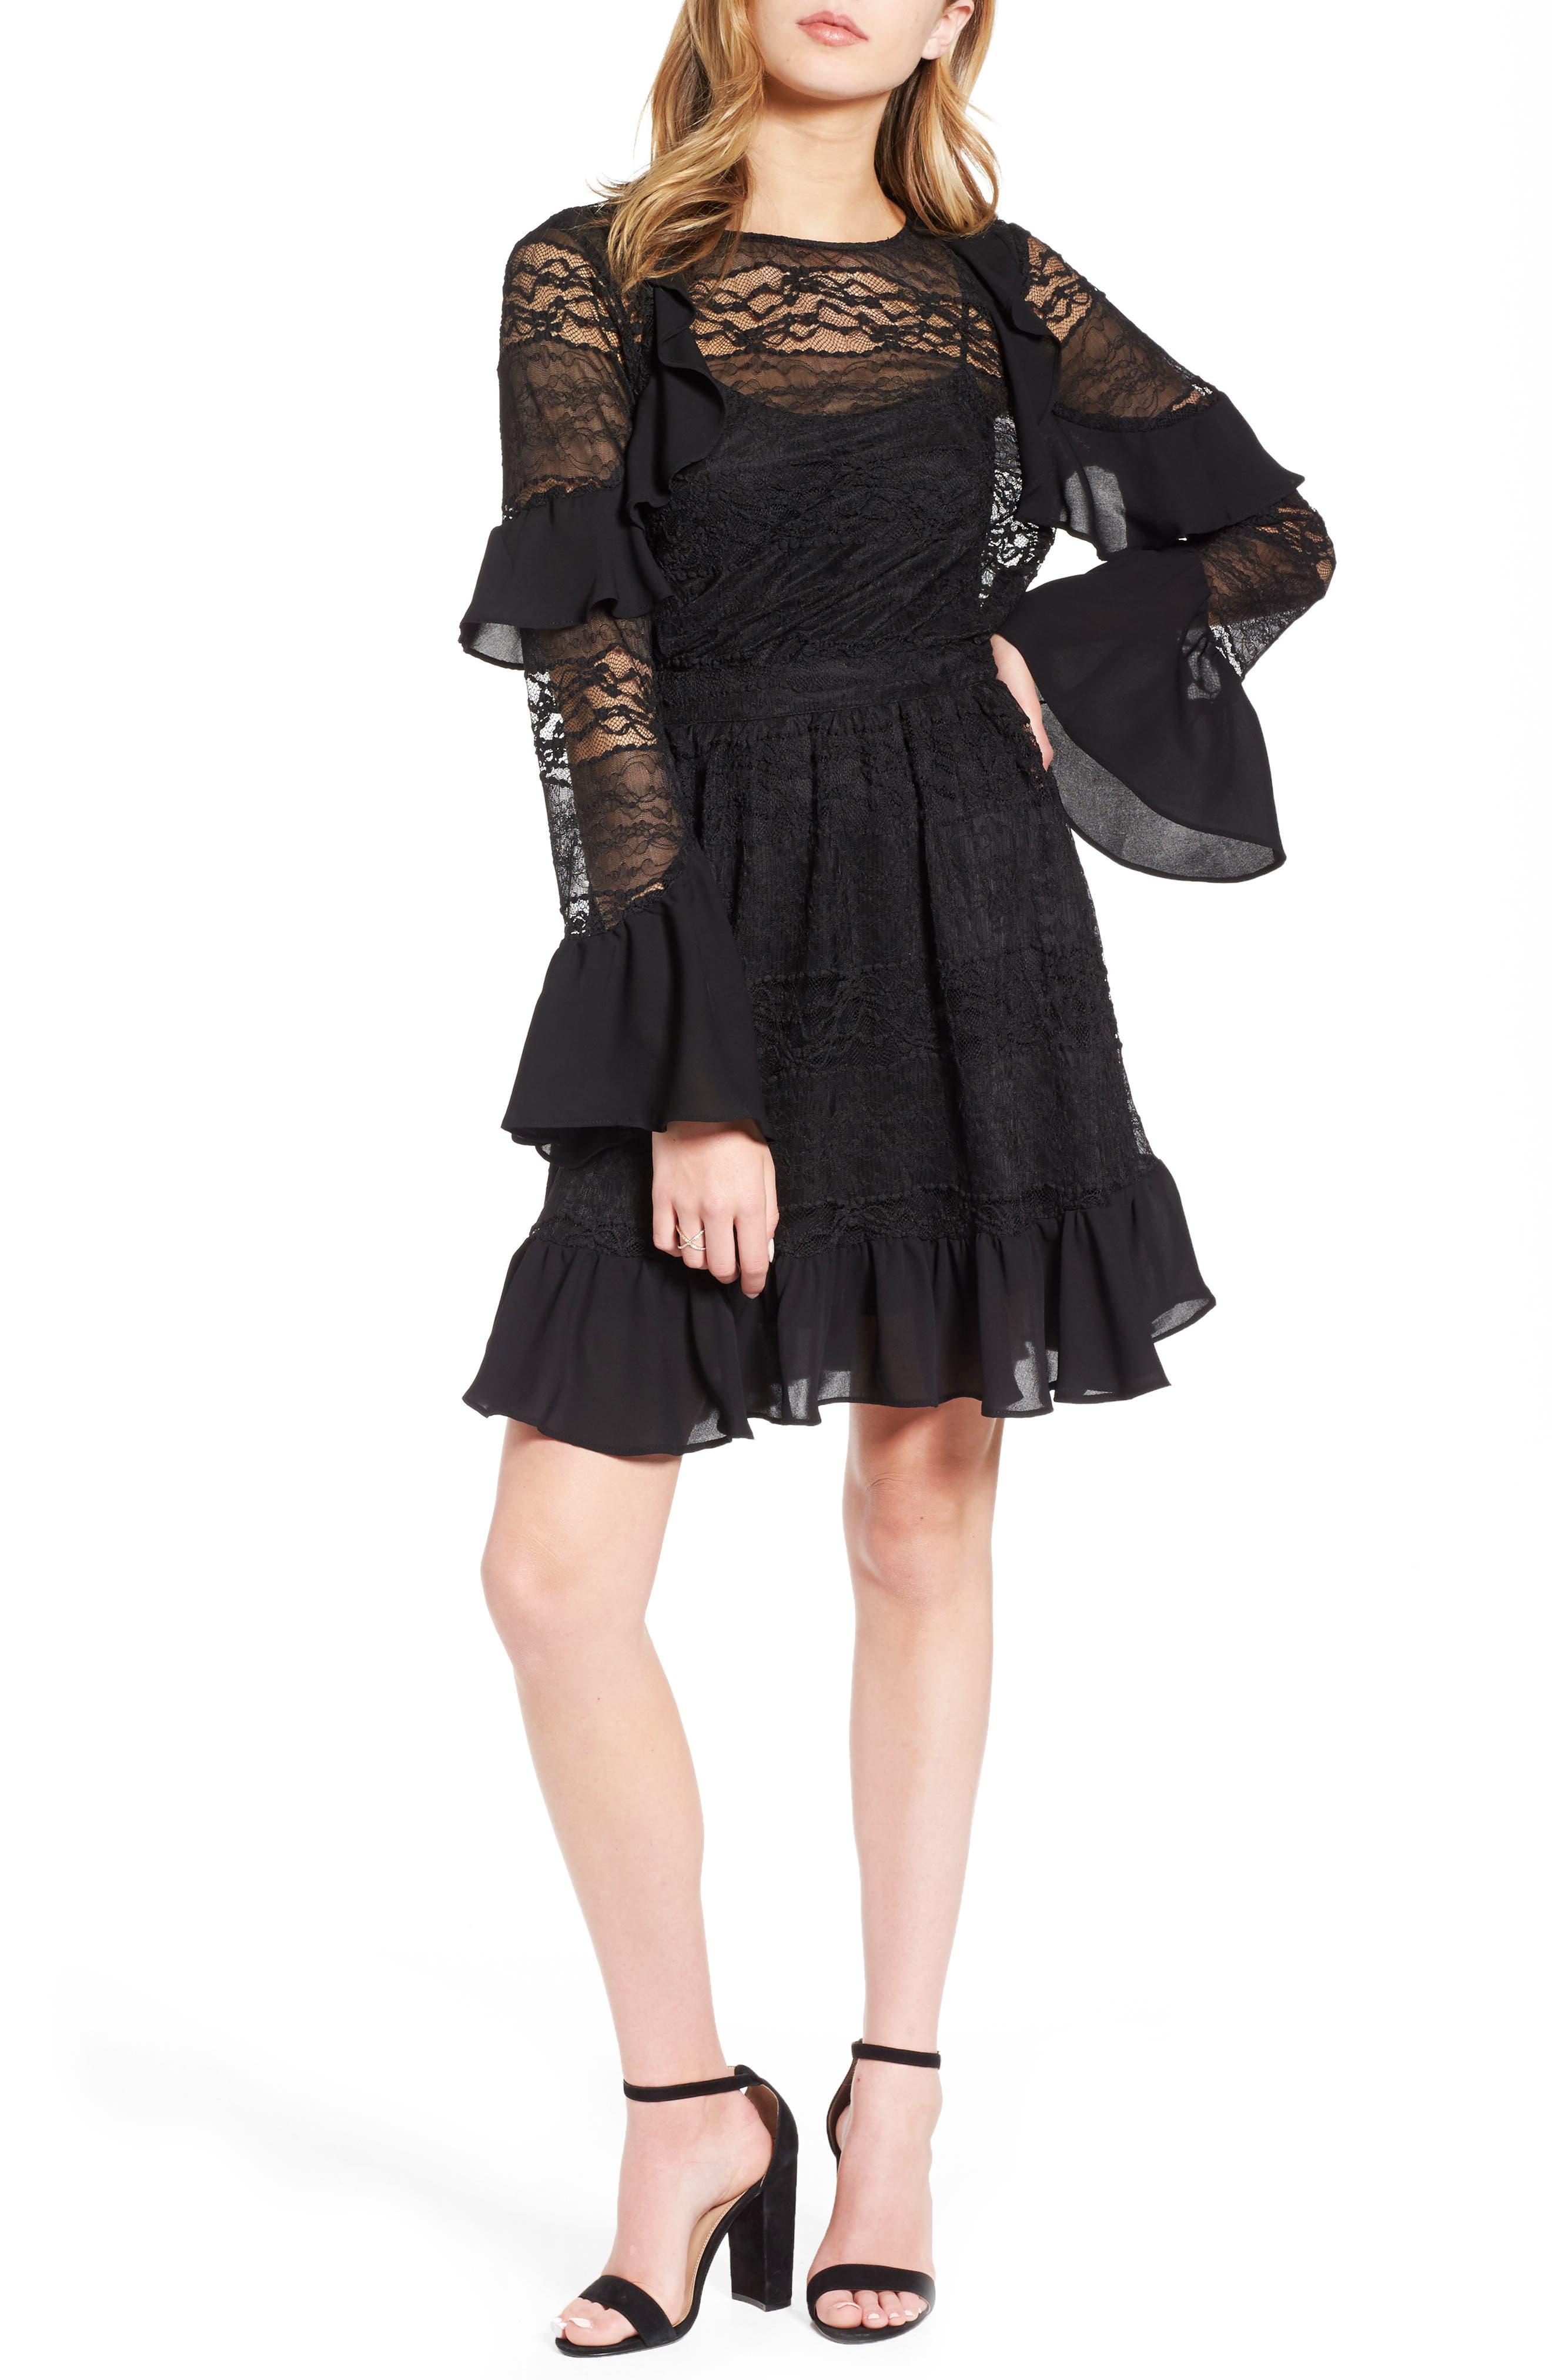 devlin Marah Lace Bell Sleeve Dress